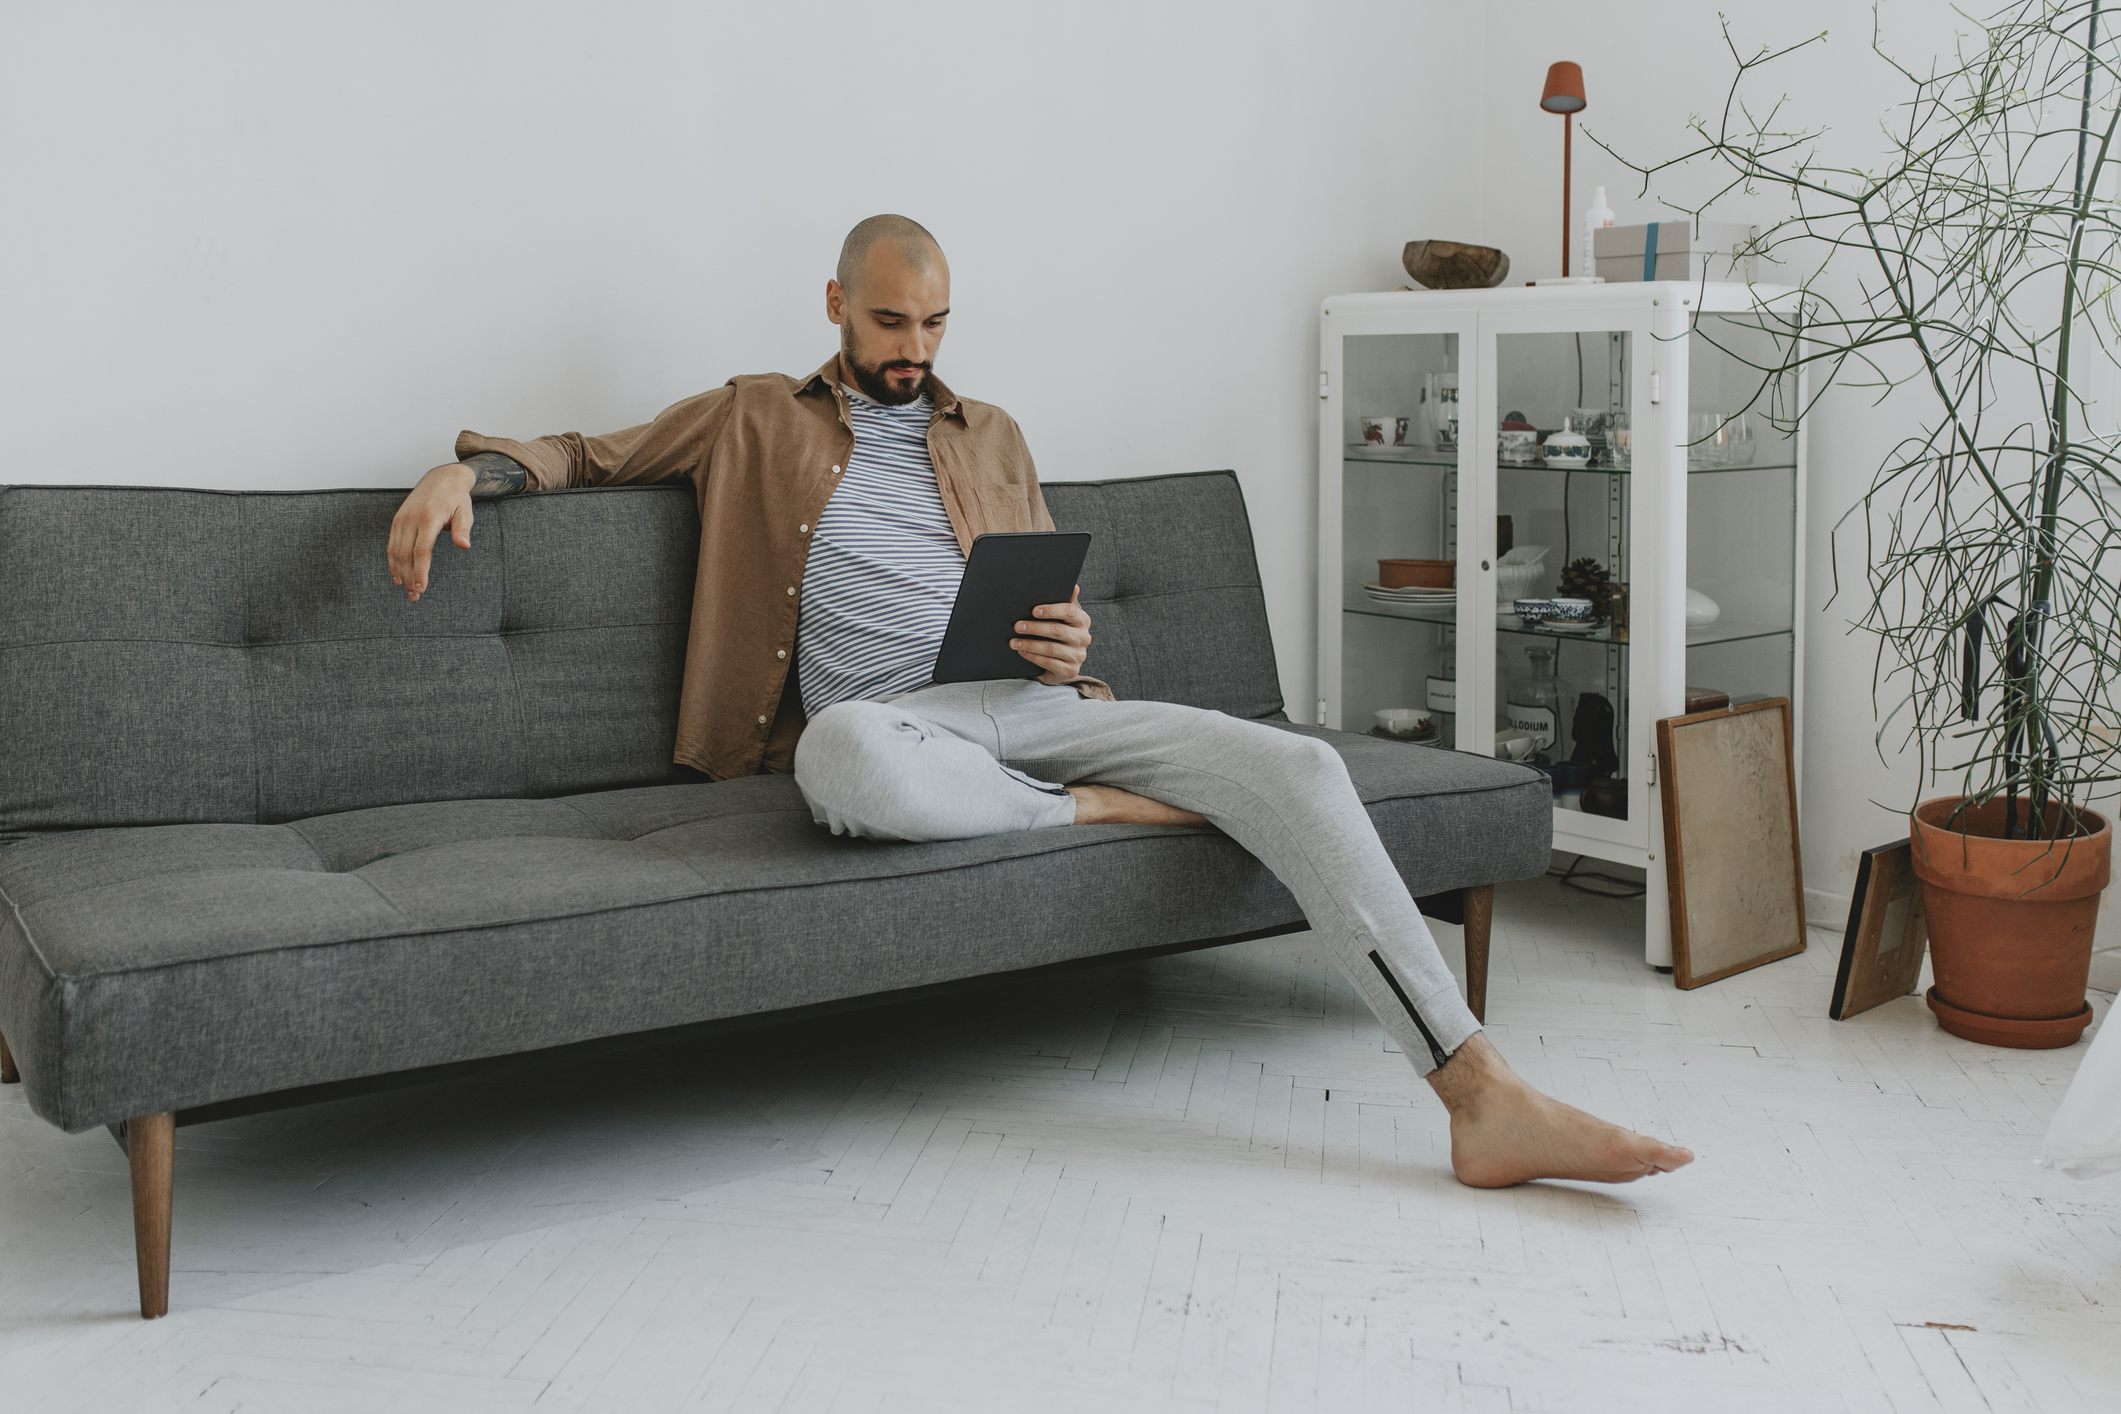 cómo vestirte para home office